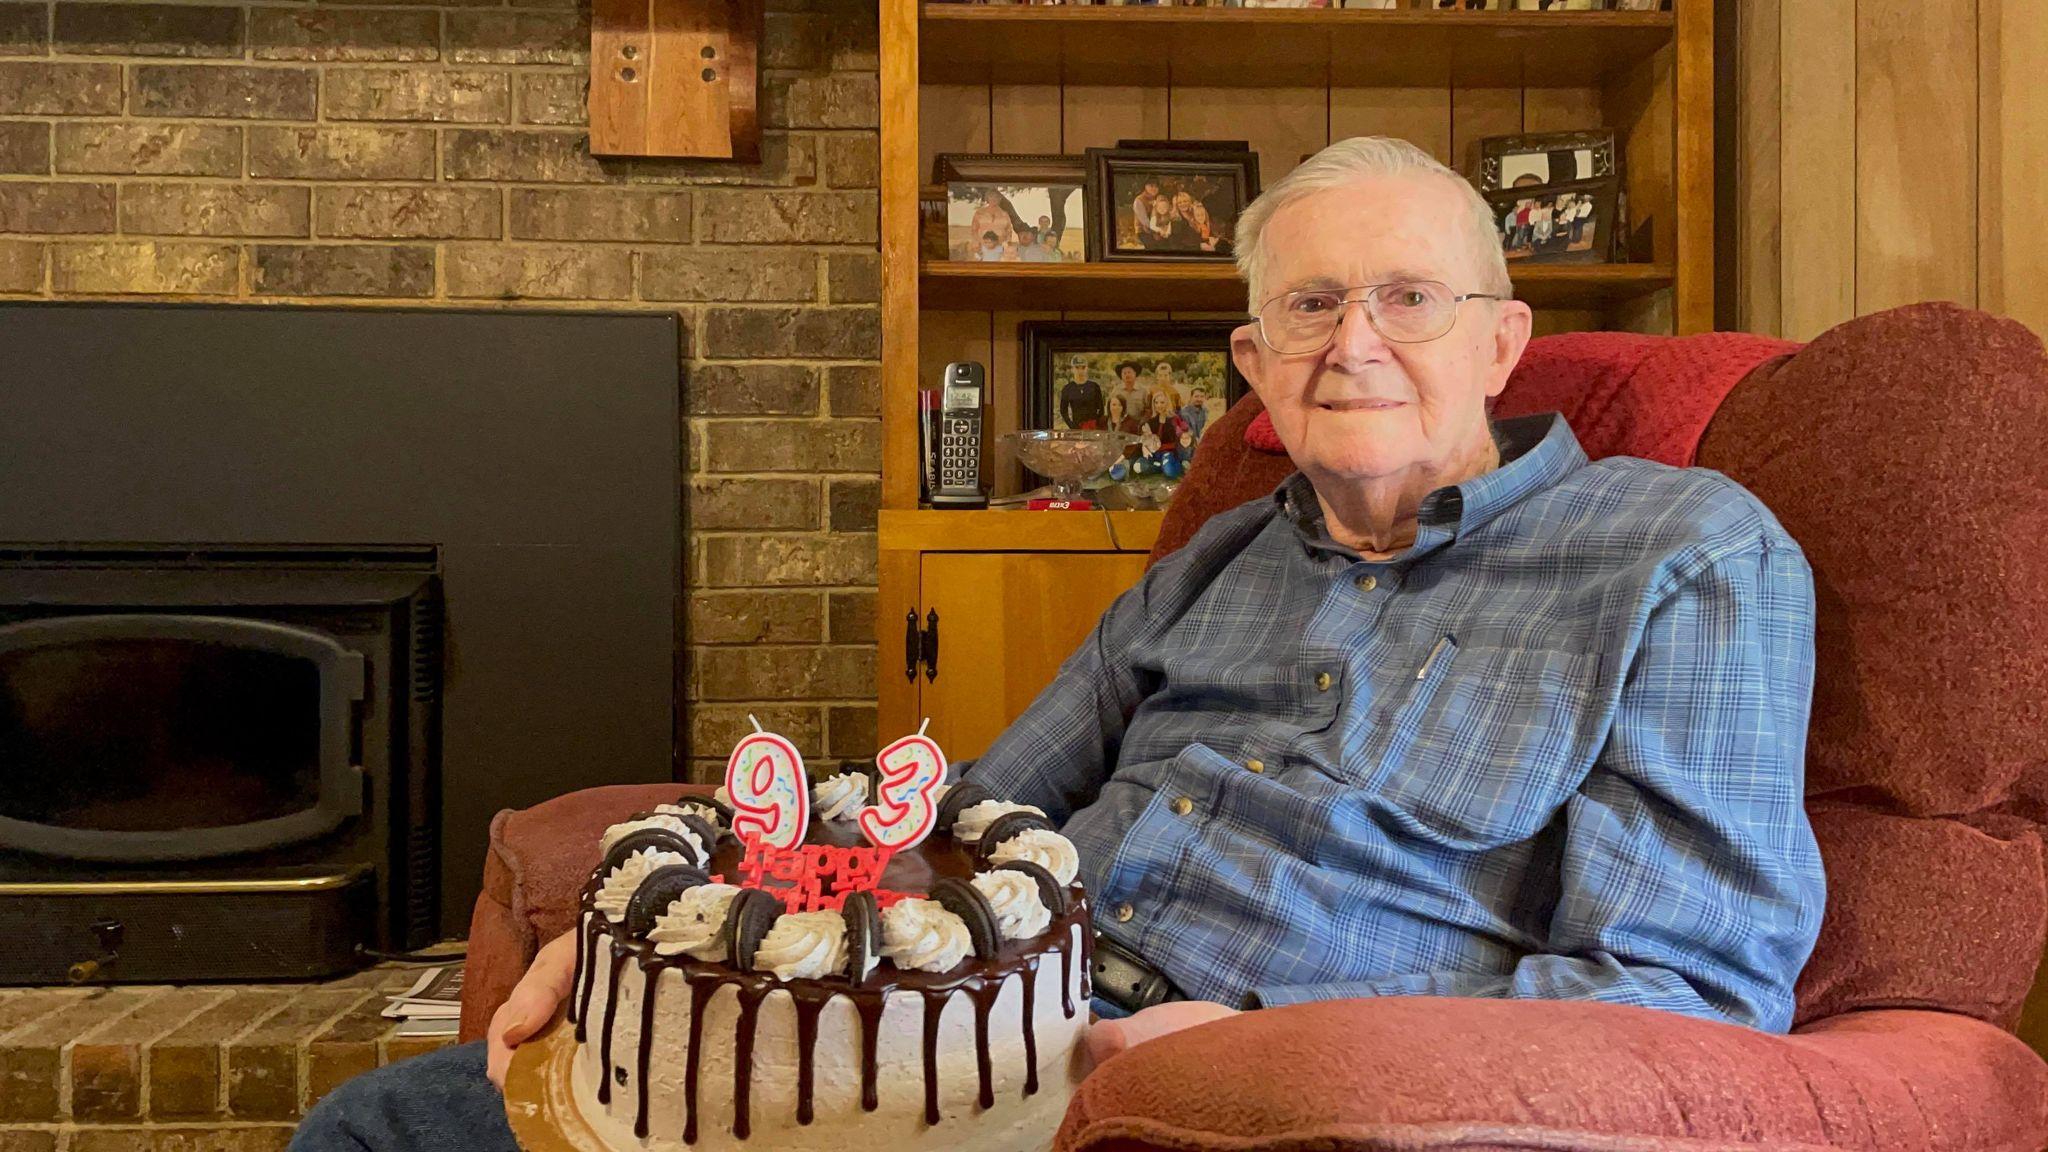 93-year-old man renews driving license, celebrates birthday